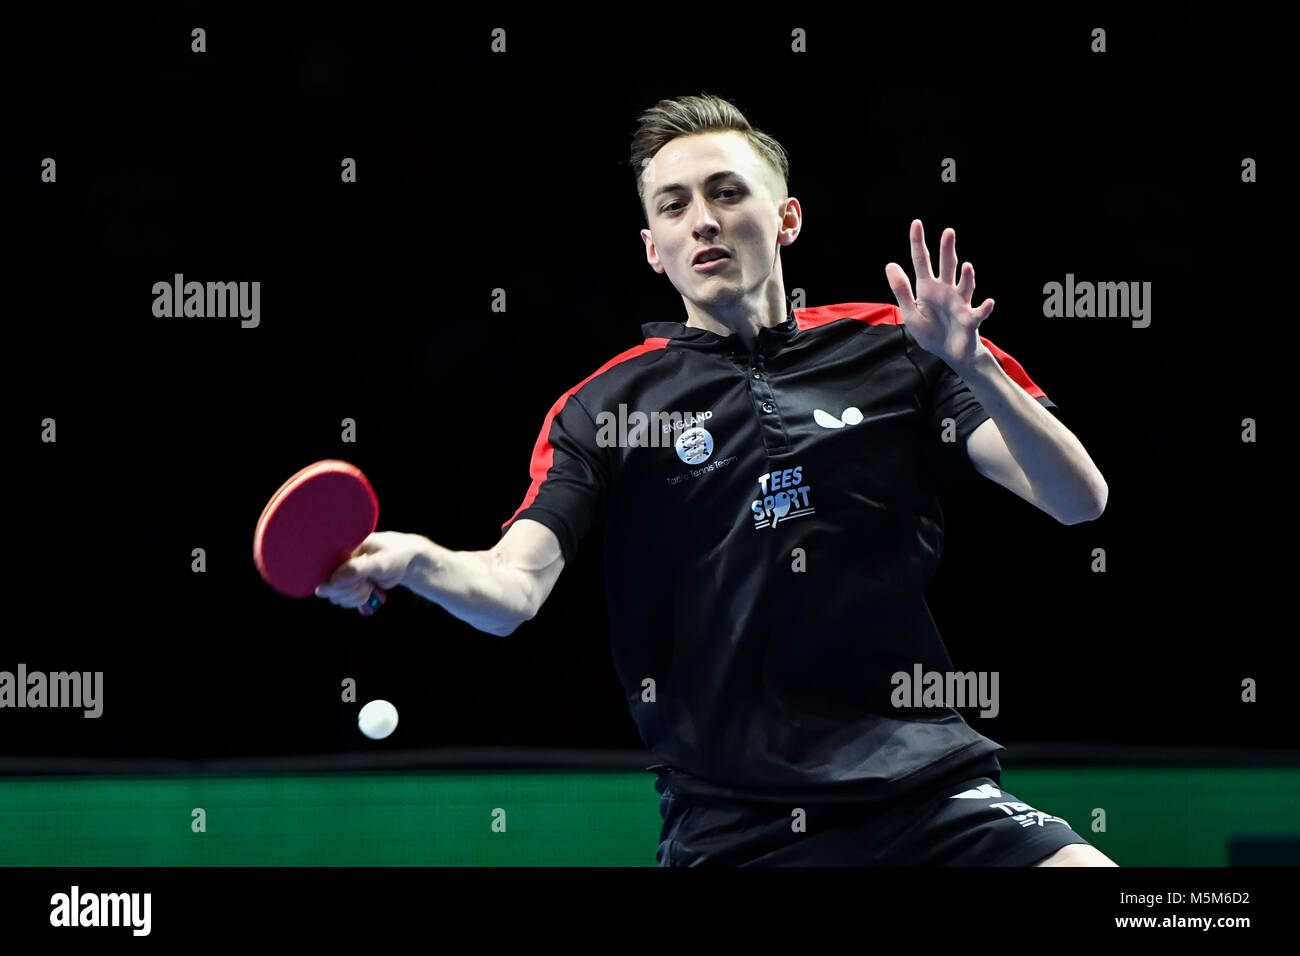 Londra, UK, 24 feb 2018. durante la International Table Tennis Federation World Team Cup match tra alla casella Immagini Stock